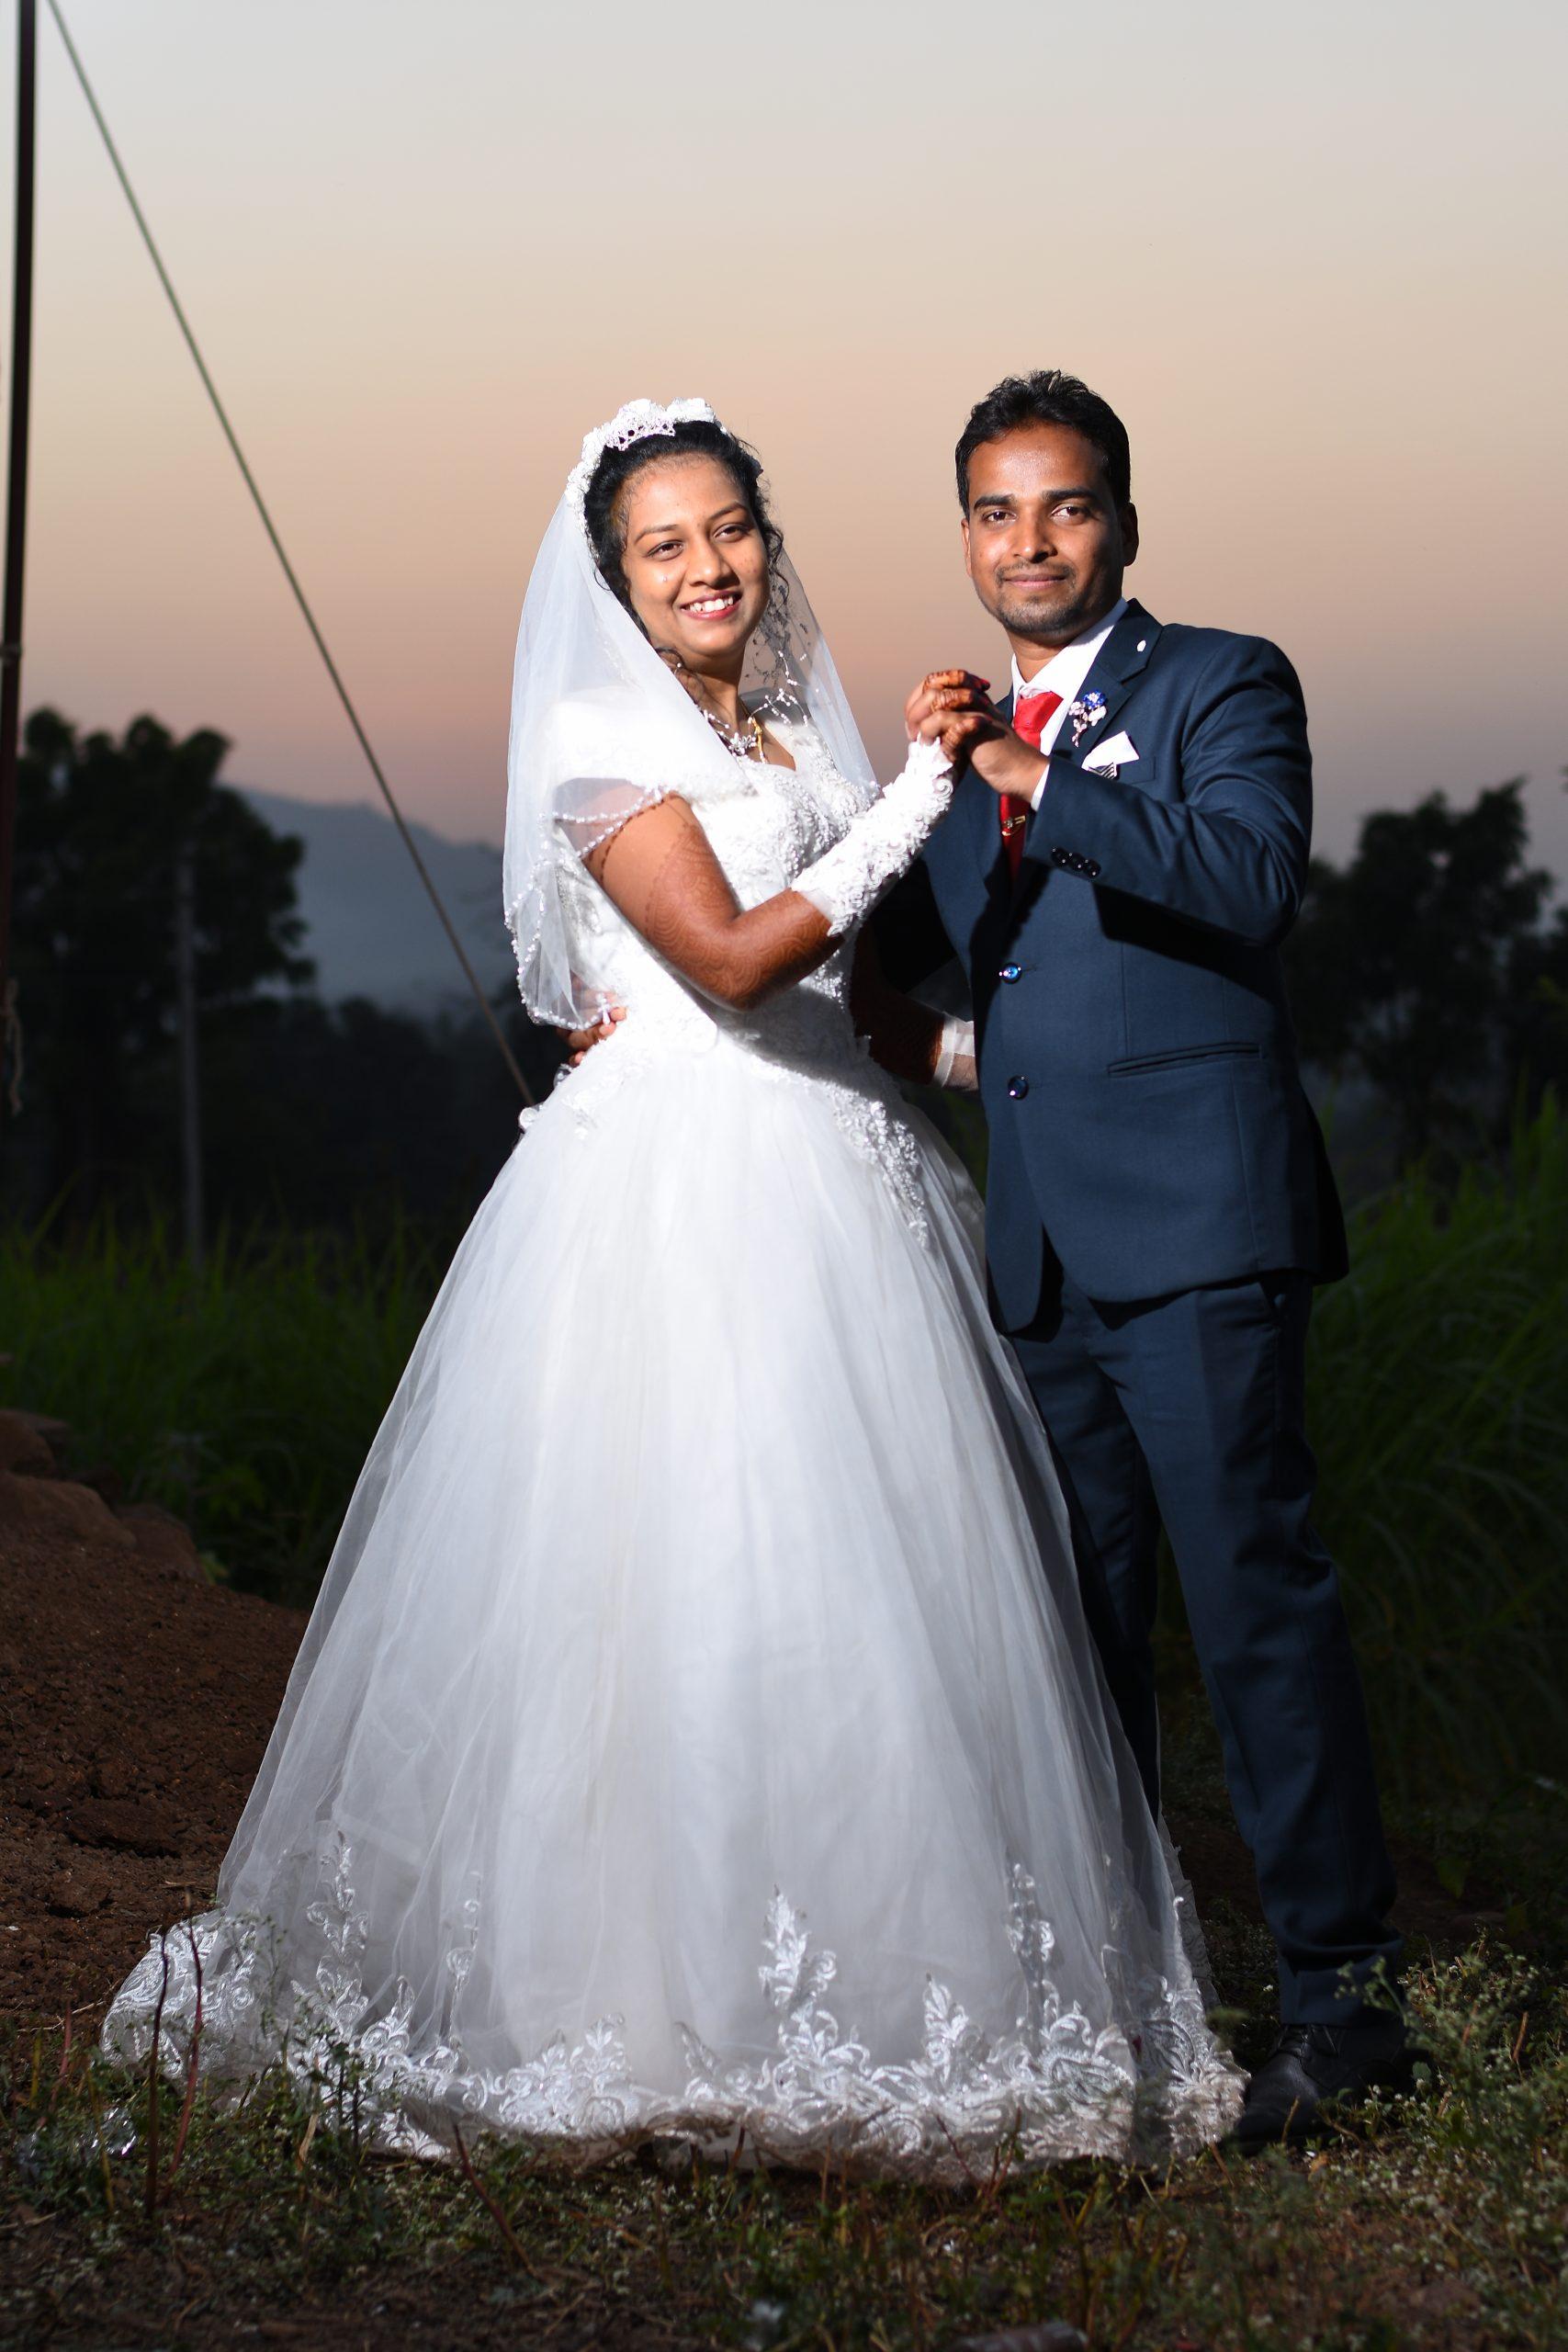 Christian couple posing on the wedding